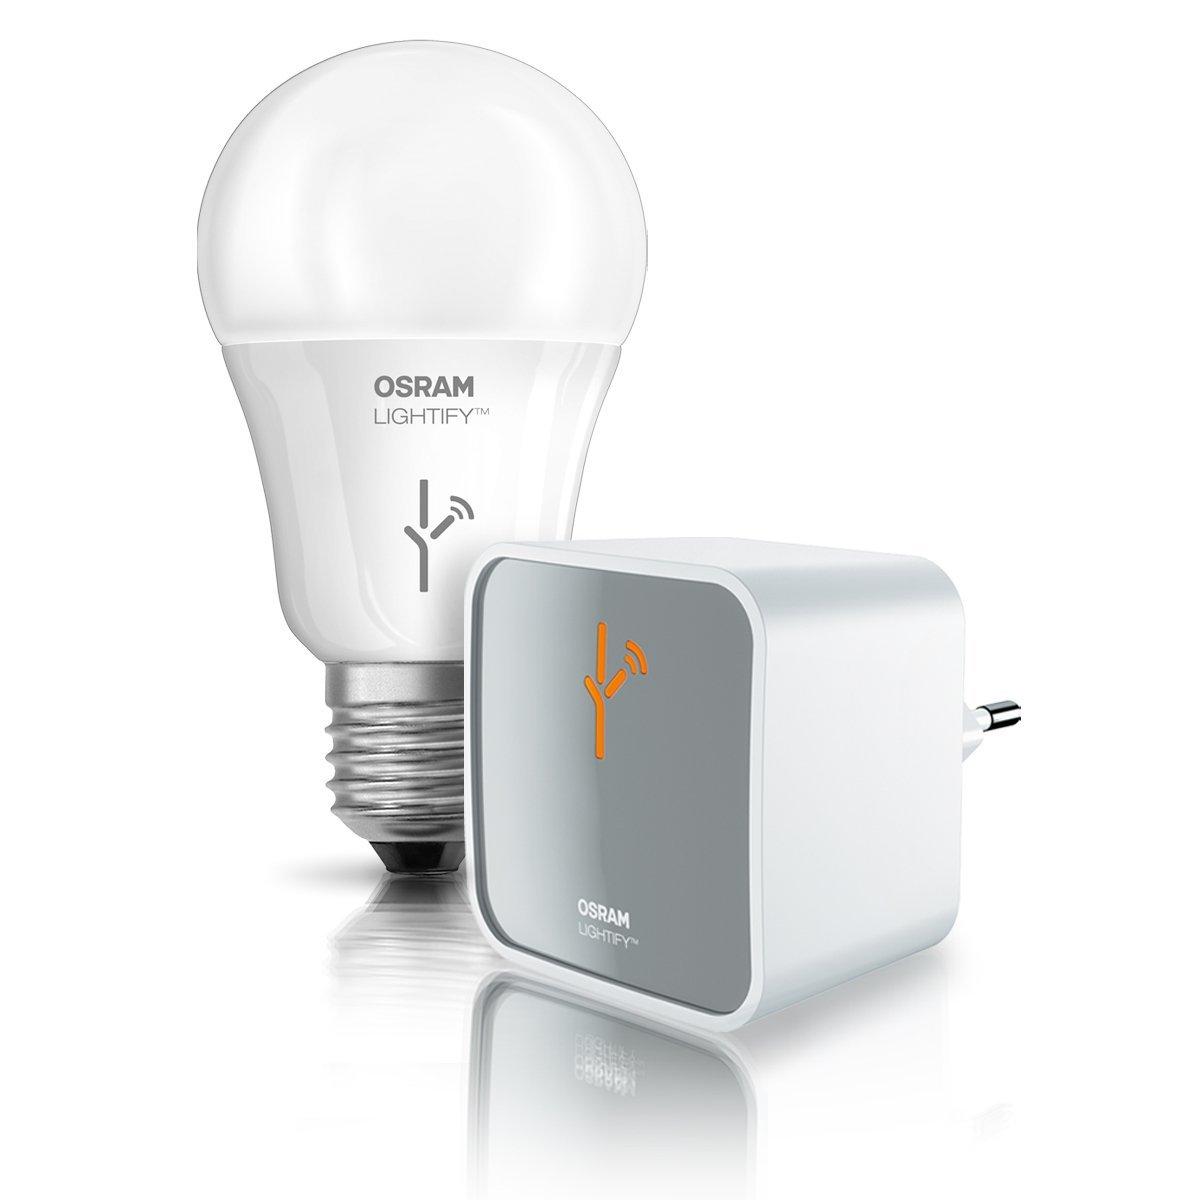 philips hue alternativen f r das smart home lichtsystem giga. Black Bedroom Furniture Sets. Home Design Ideas